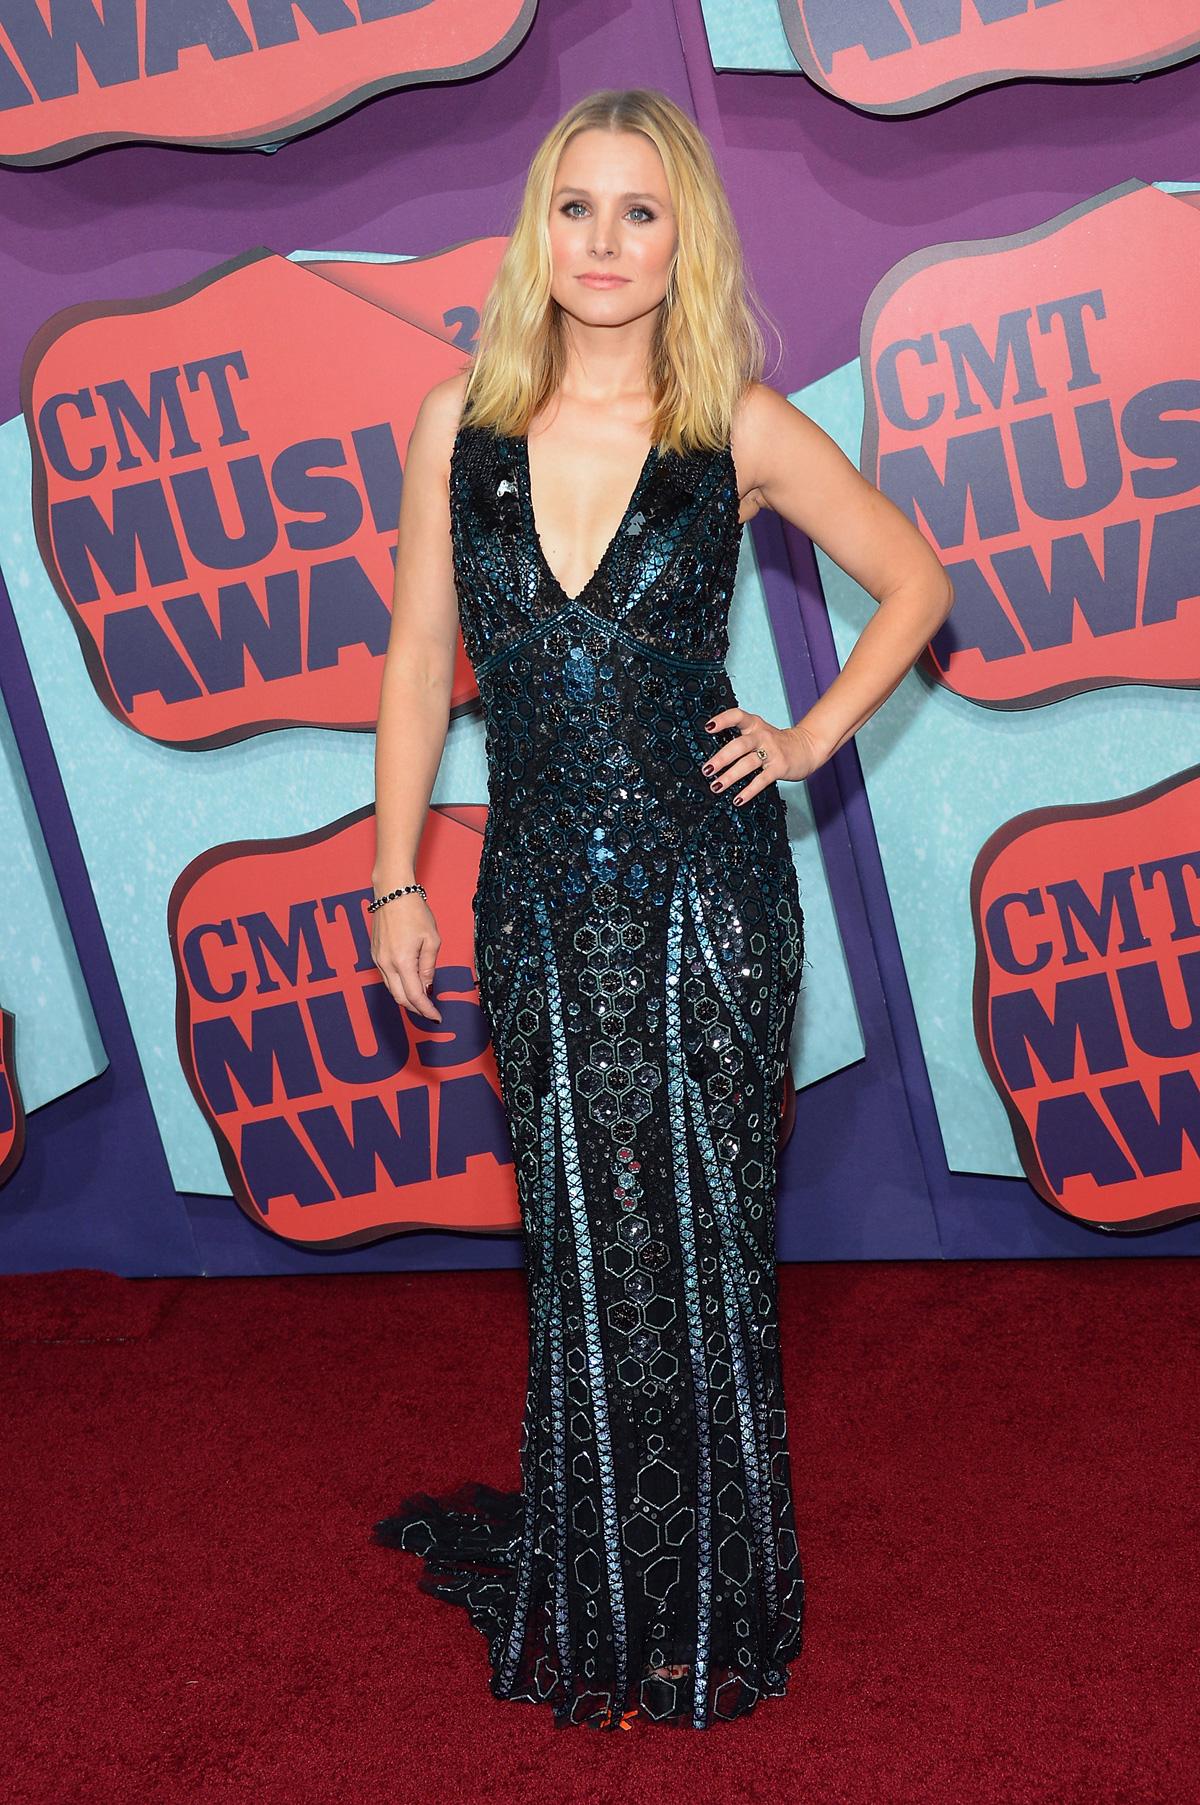 Kristen Bellat the the 2014 CMT Music Awards